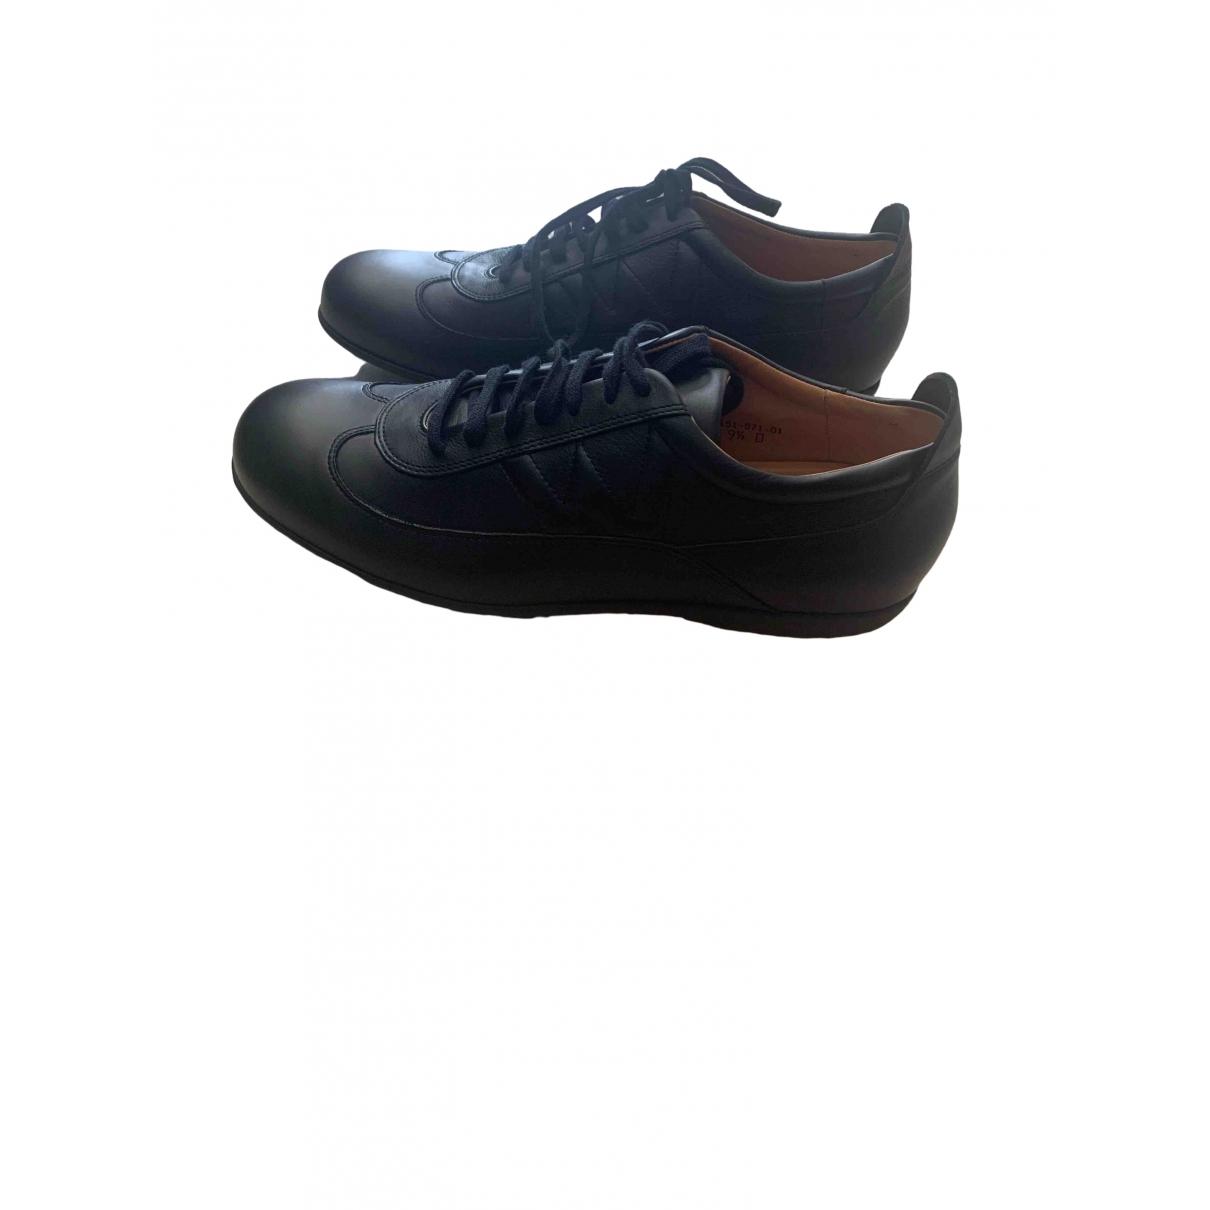 Jm Weston \N Black Leather Trainers for Men 9.5 US